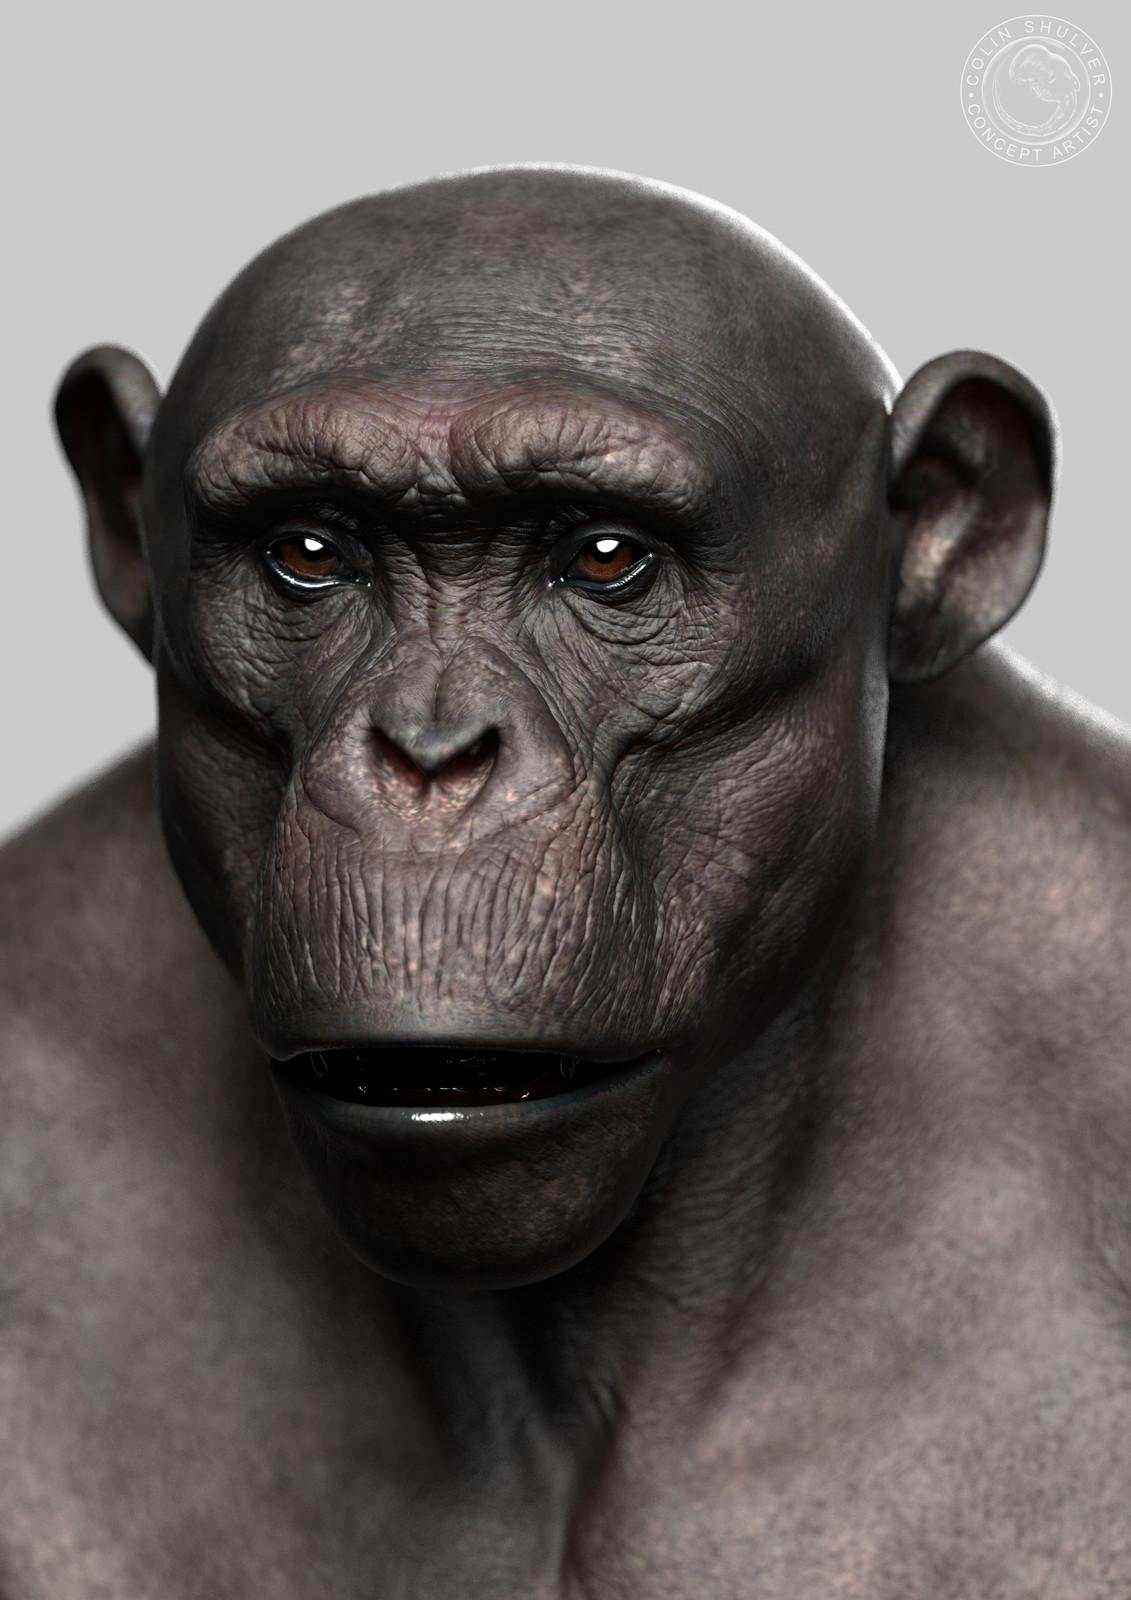 Chimpanzee - Part 1